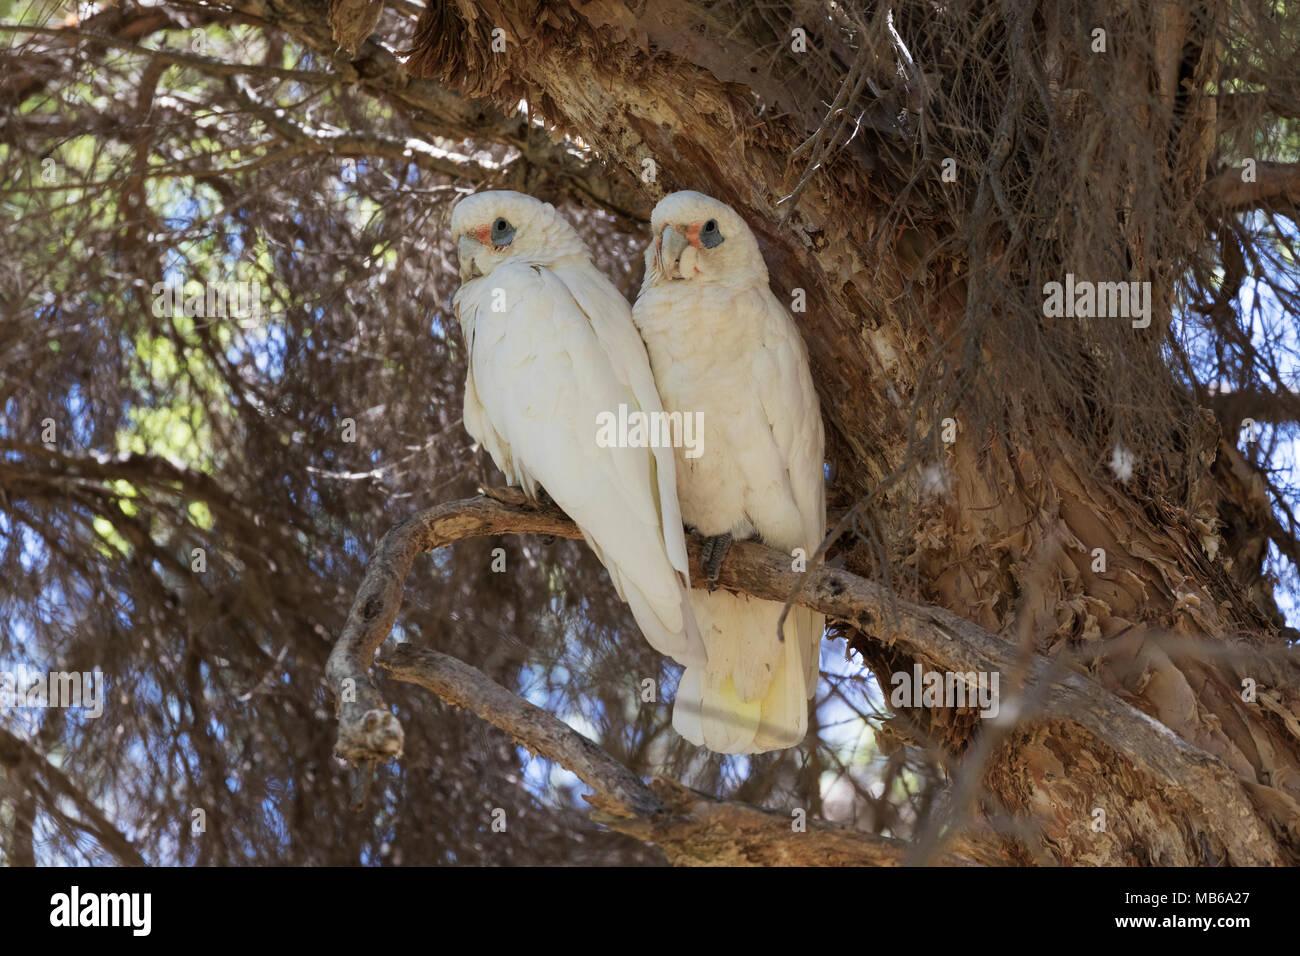 A pair of Little Corellas (Cacatua sanguinea) in Neil Hawkins Park, Lake Joondalup, Western AustraliaLittle Corella (Cacatua sanguinea) - Stock Image